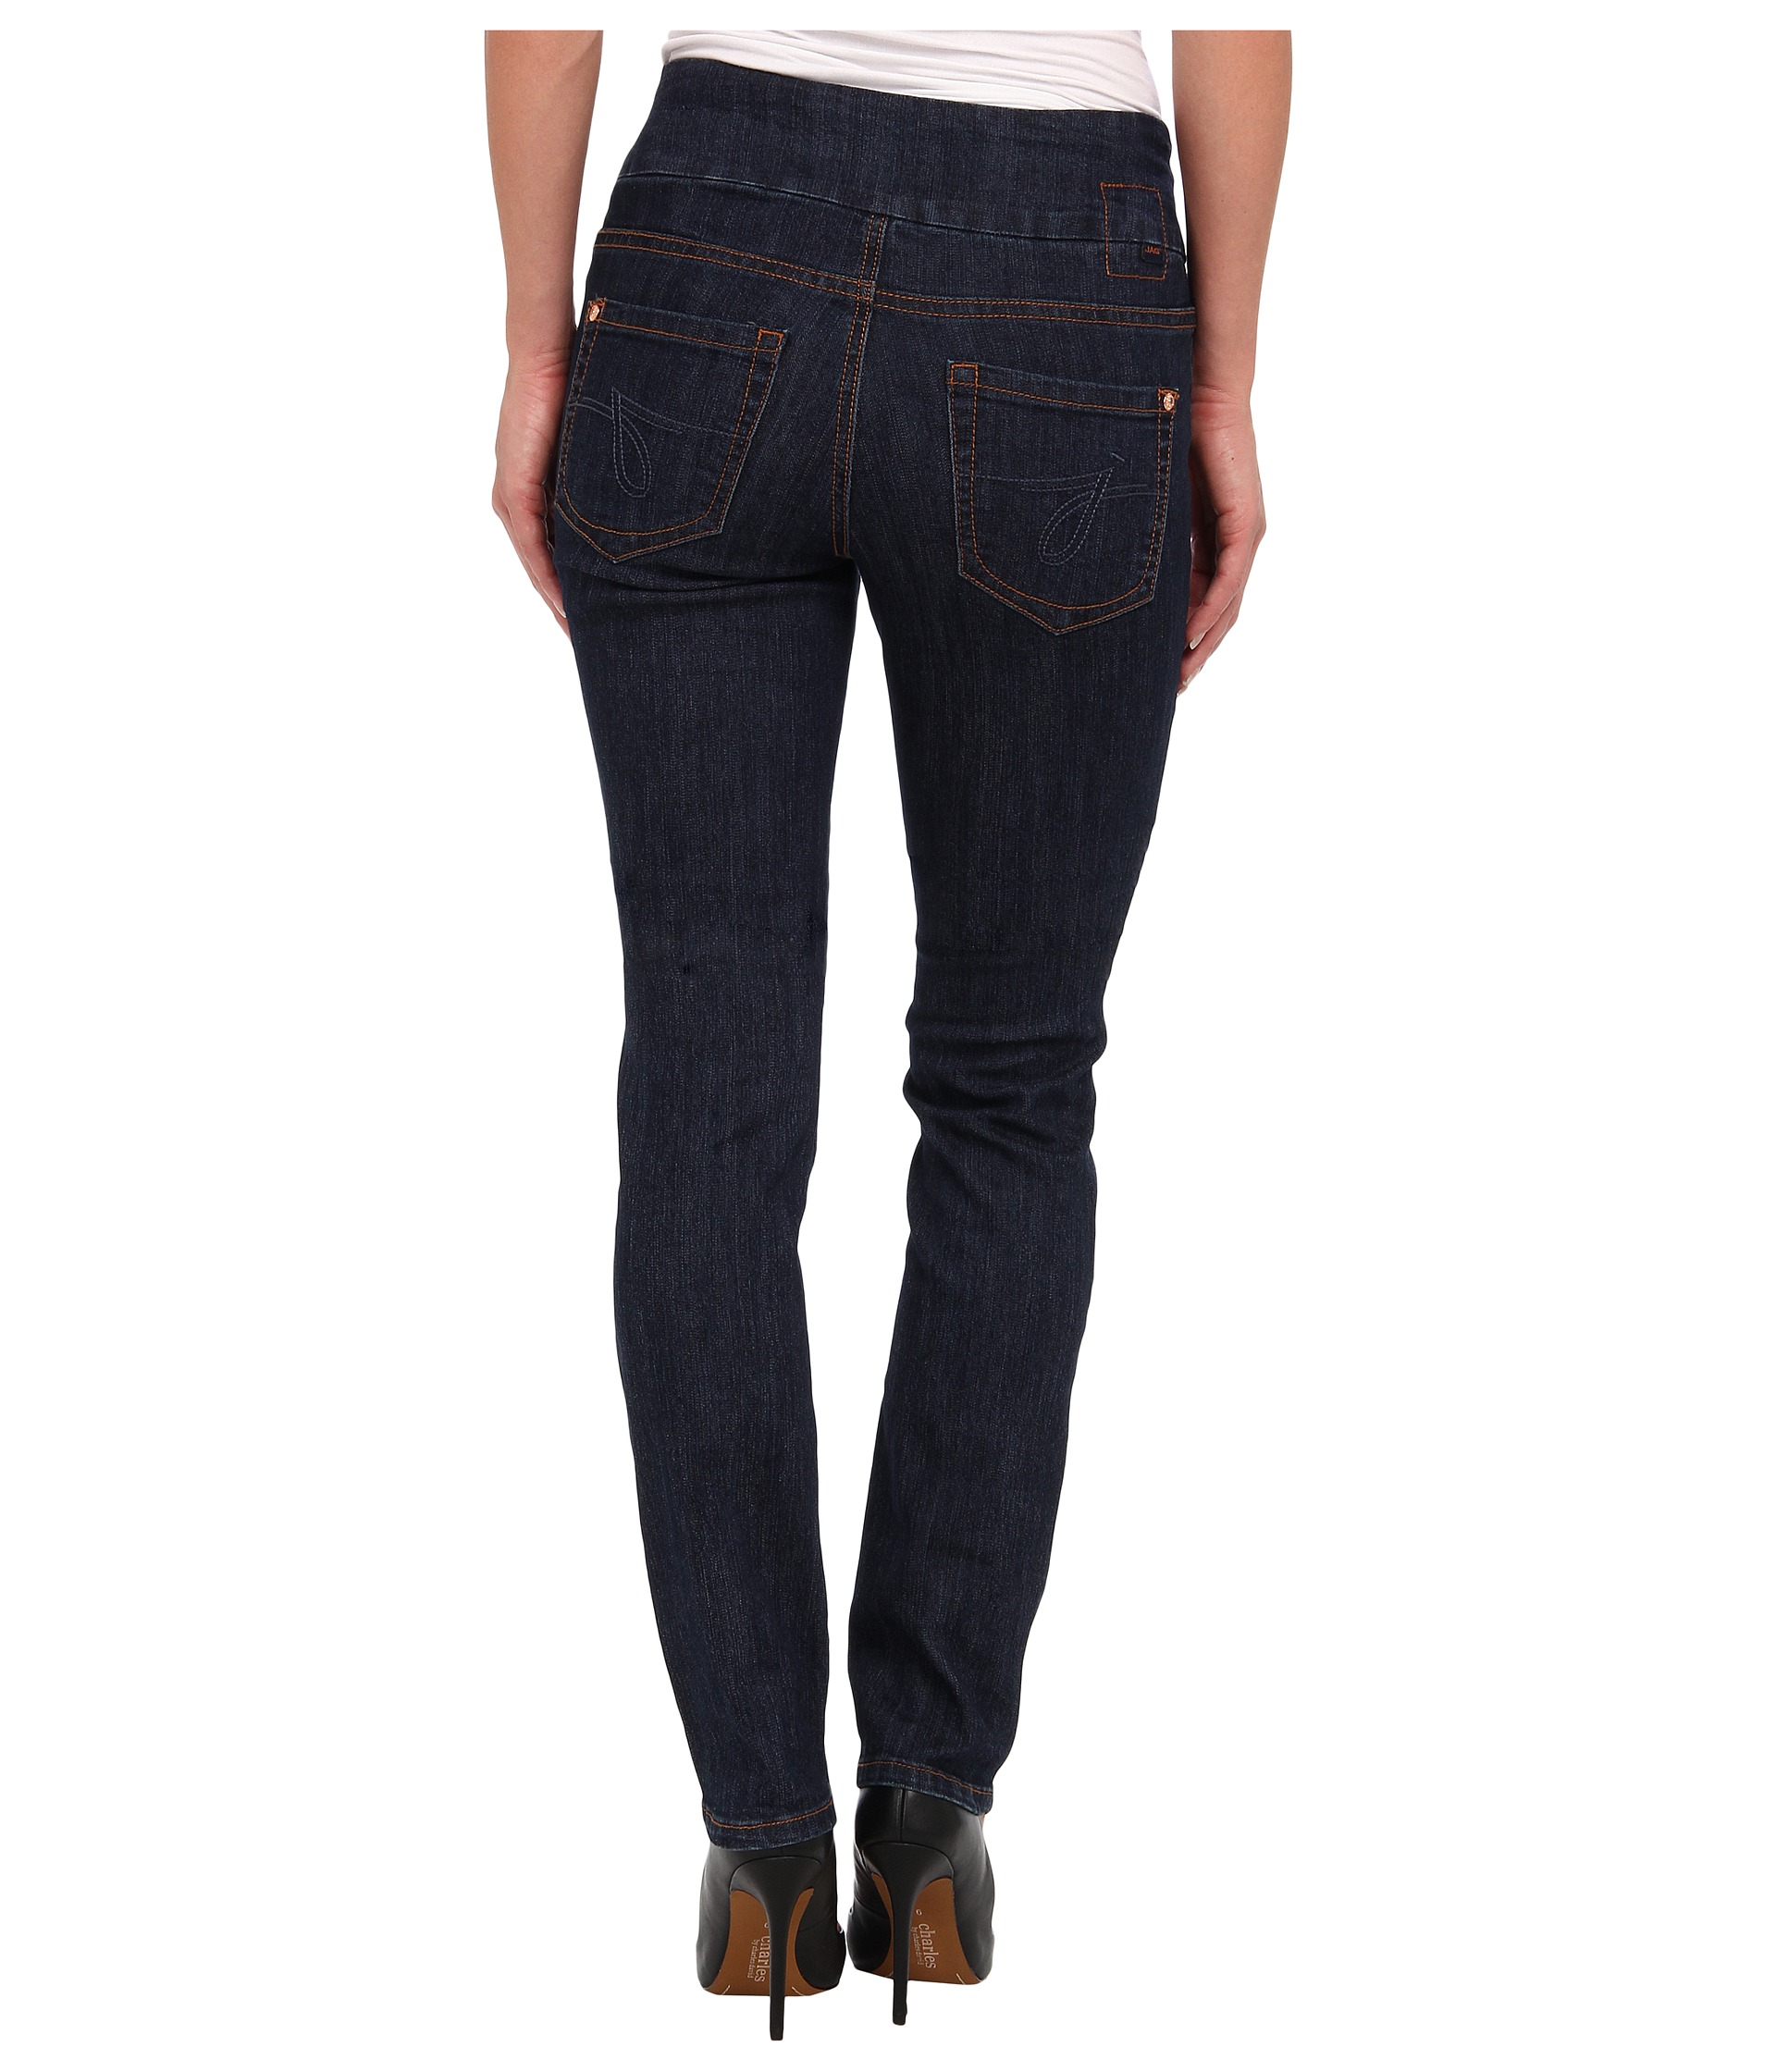 Jag Jeans Malia Pull-On Slim in Dark Shadow at Zappos.com